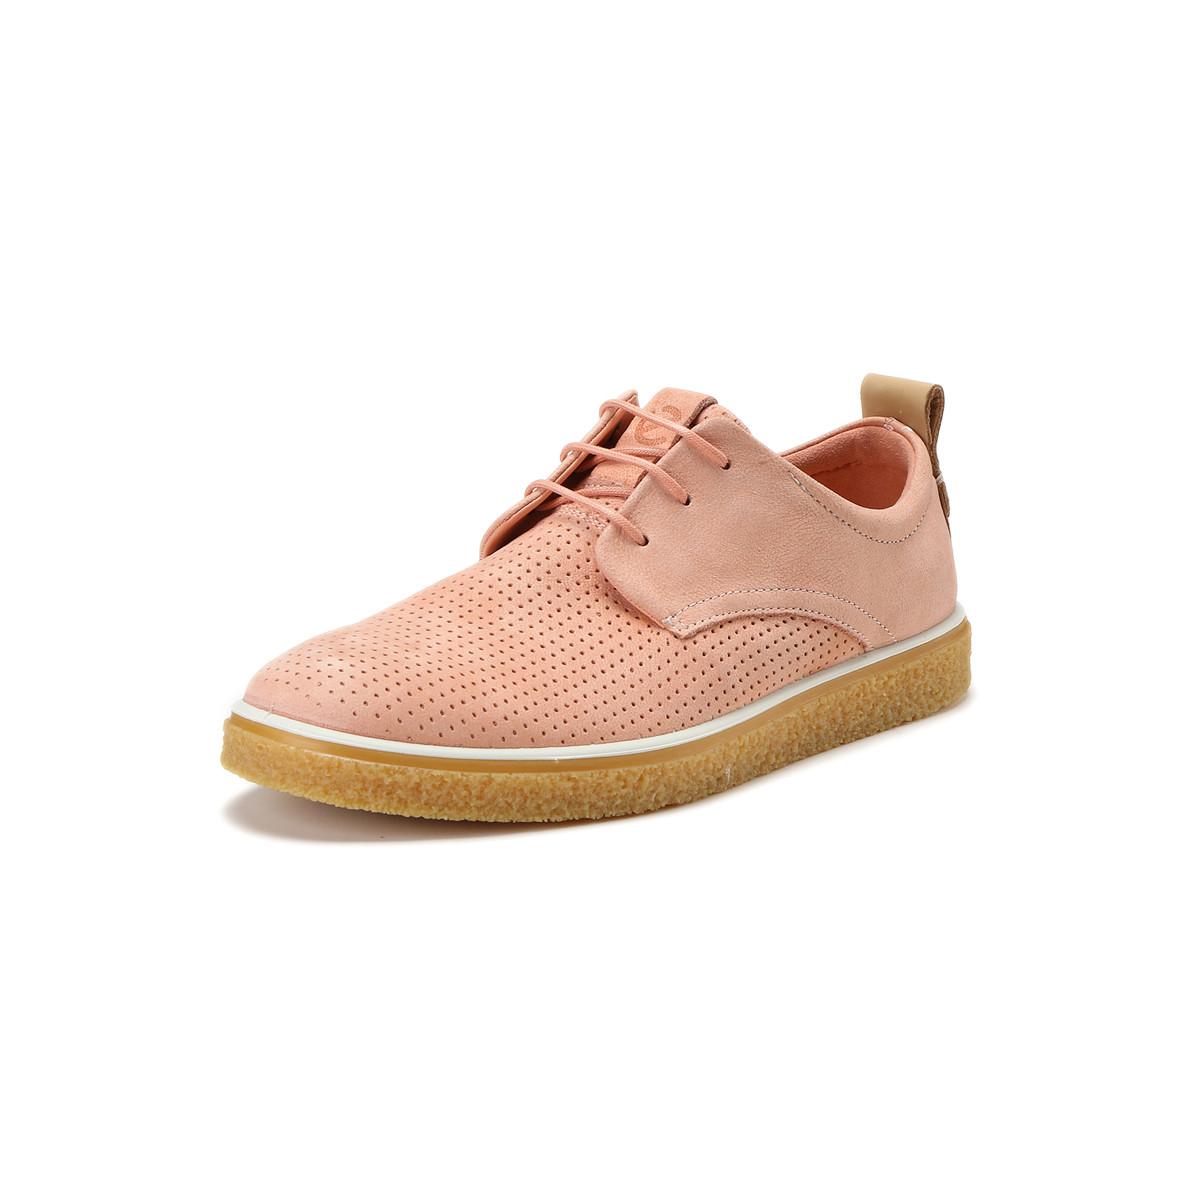 ECCO 爱步 Crepetray 酷锐 打孔版 系带女式休闲鞋 ¥359包邮 3色可选